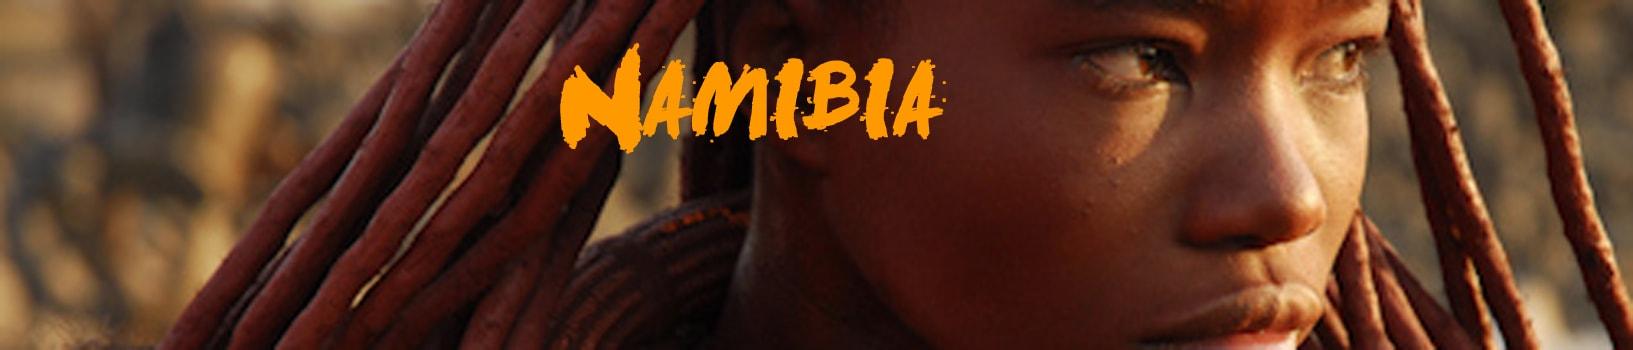 viaje-nambia